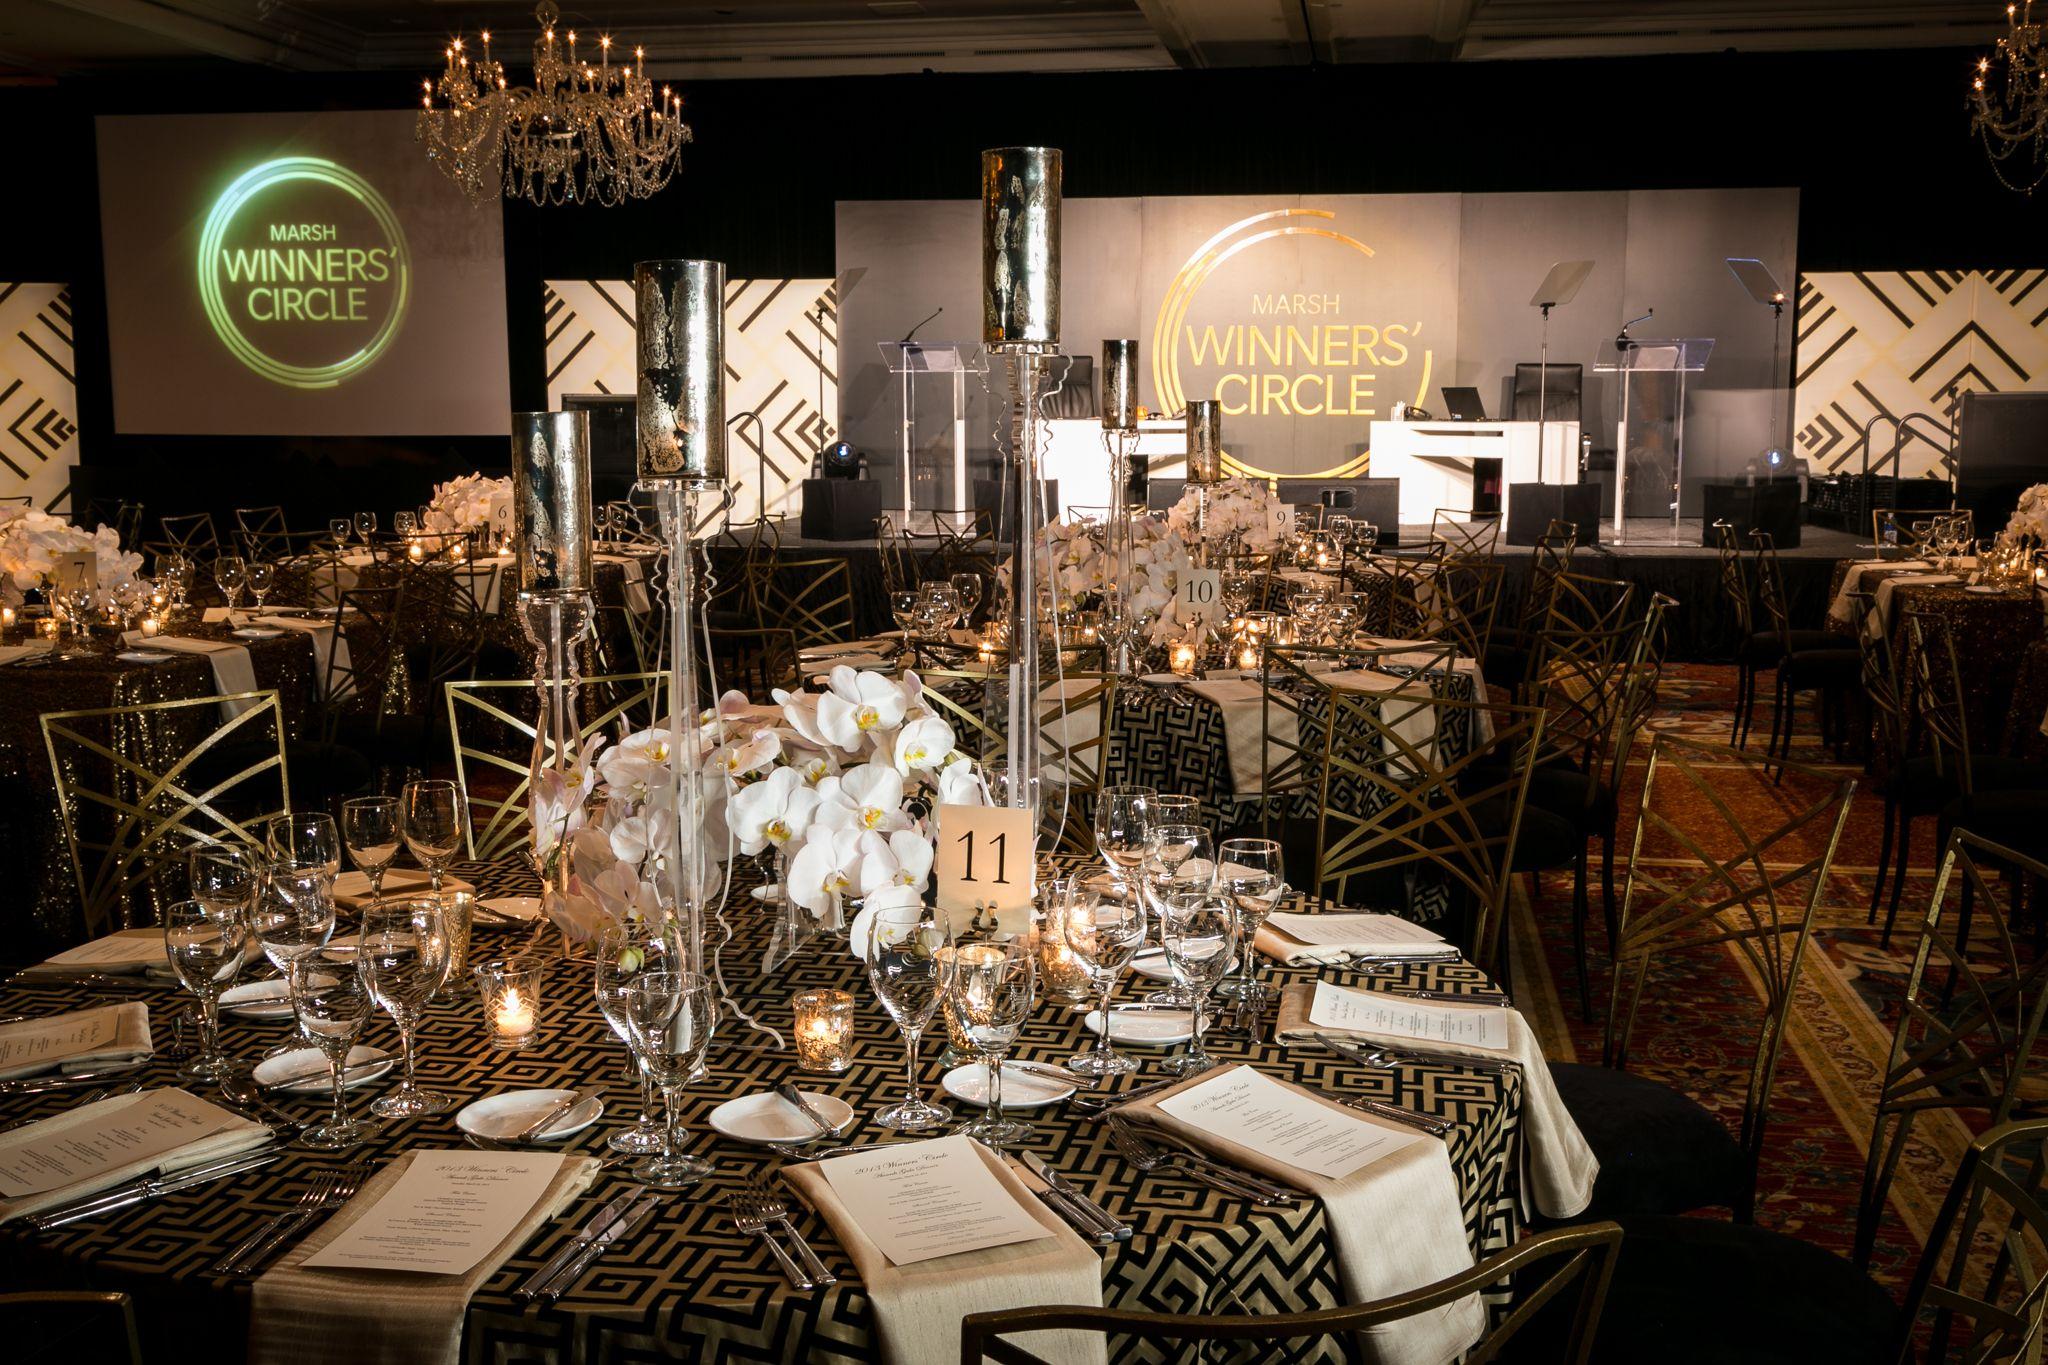 #Corporate #Events #Eventcreative #Gold #Black #Decor #Tables #Marsh